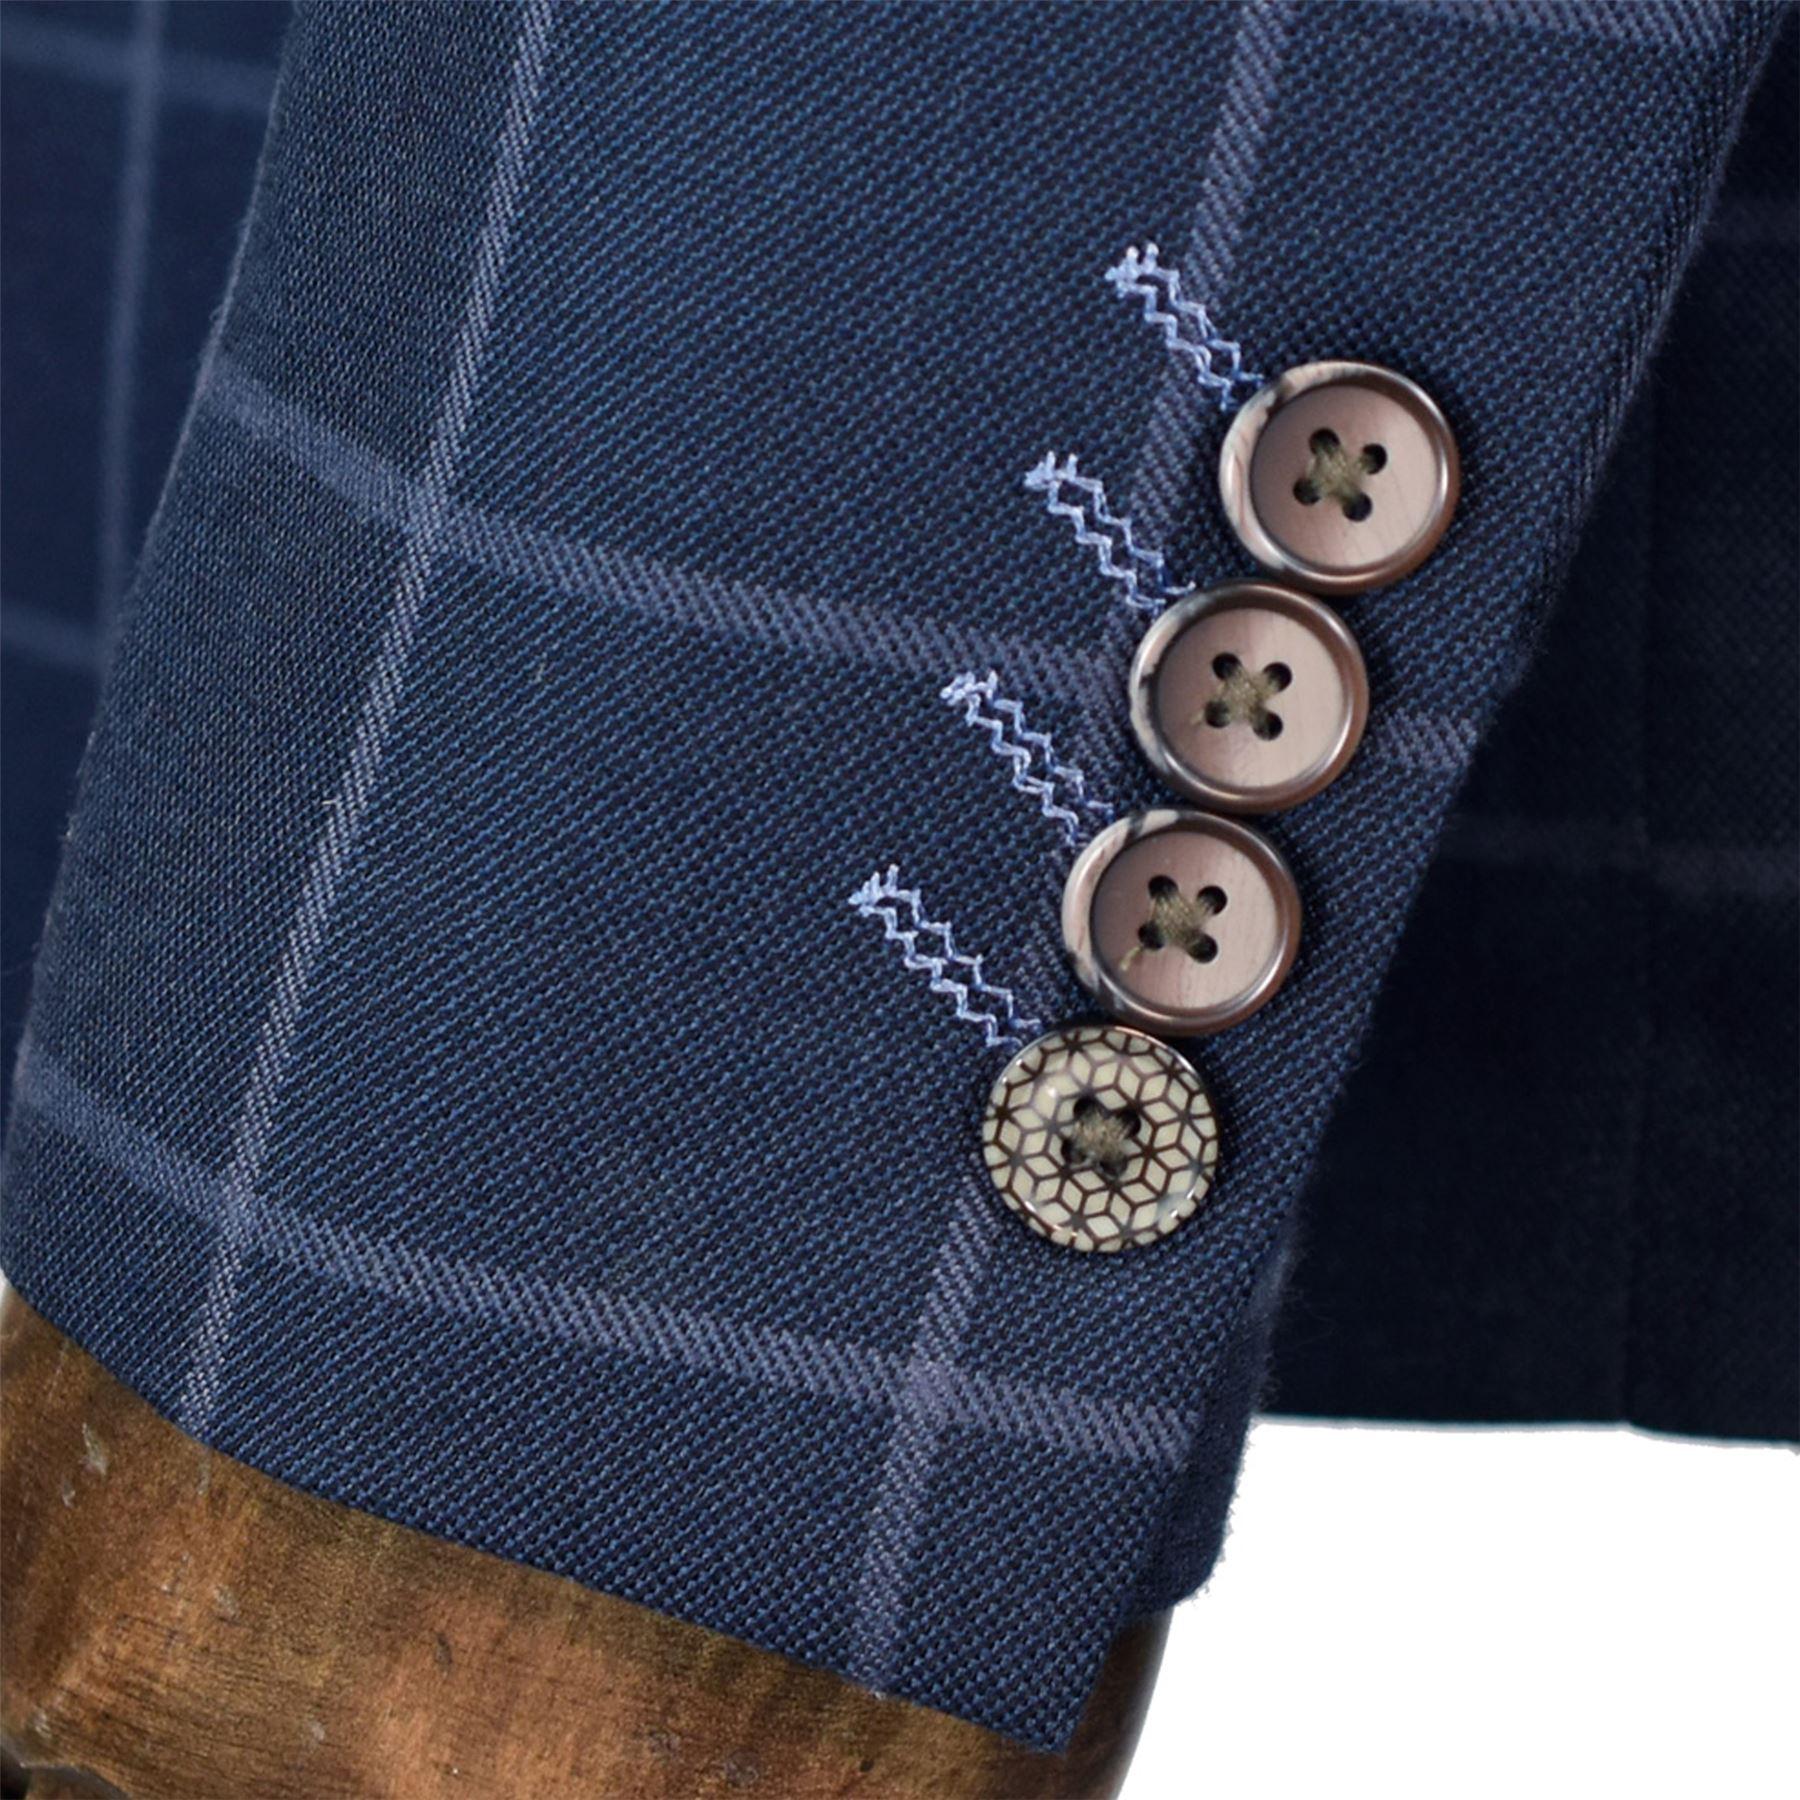 Blazer-Para-Hombre-Cavani-Macy-Boda-Chaleco-Pantalones-3-piezas-traje-se-vende-por-separado miniatura 4